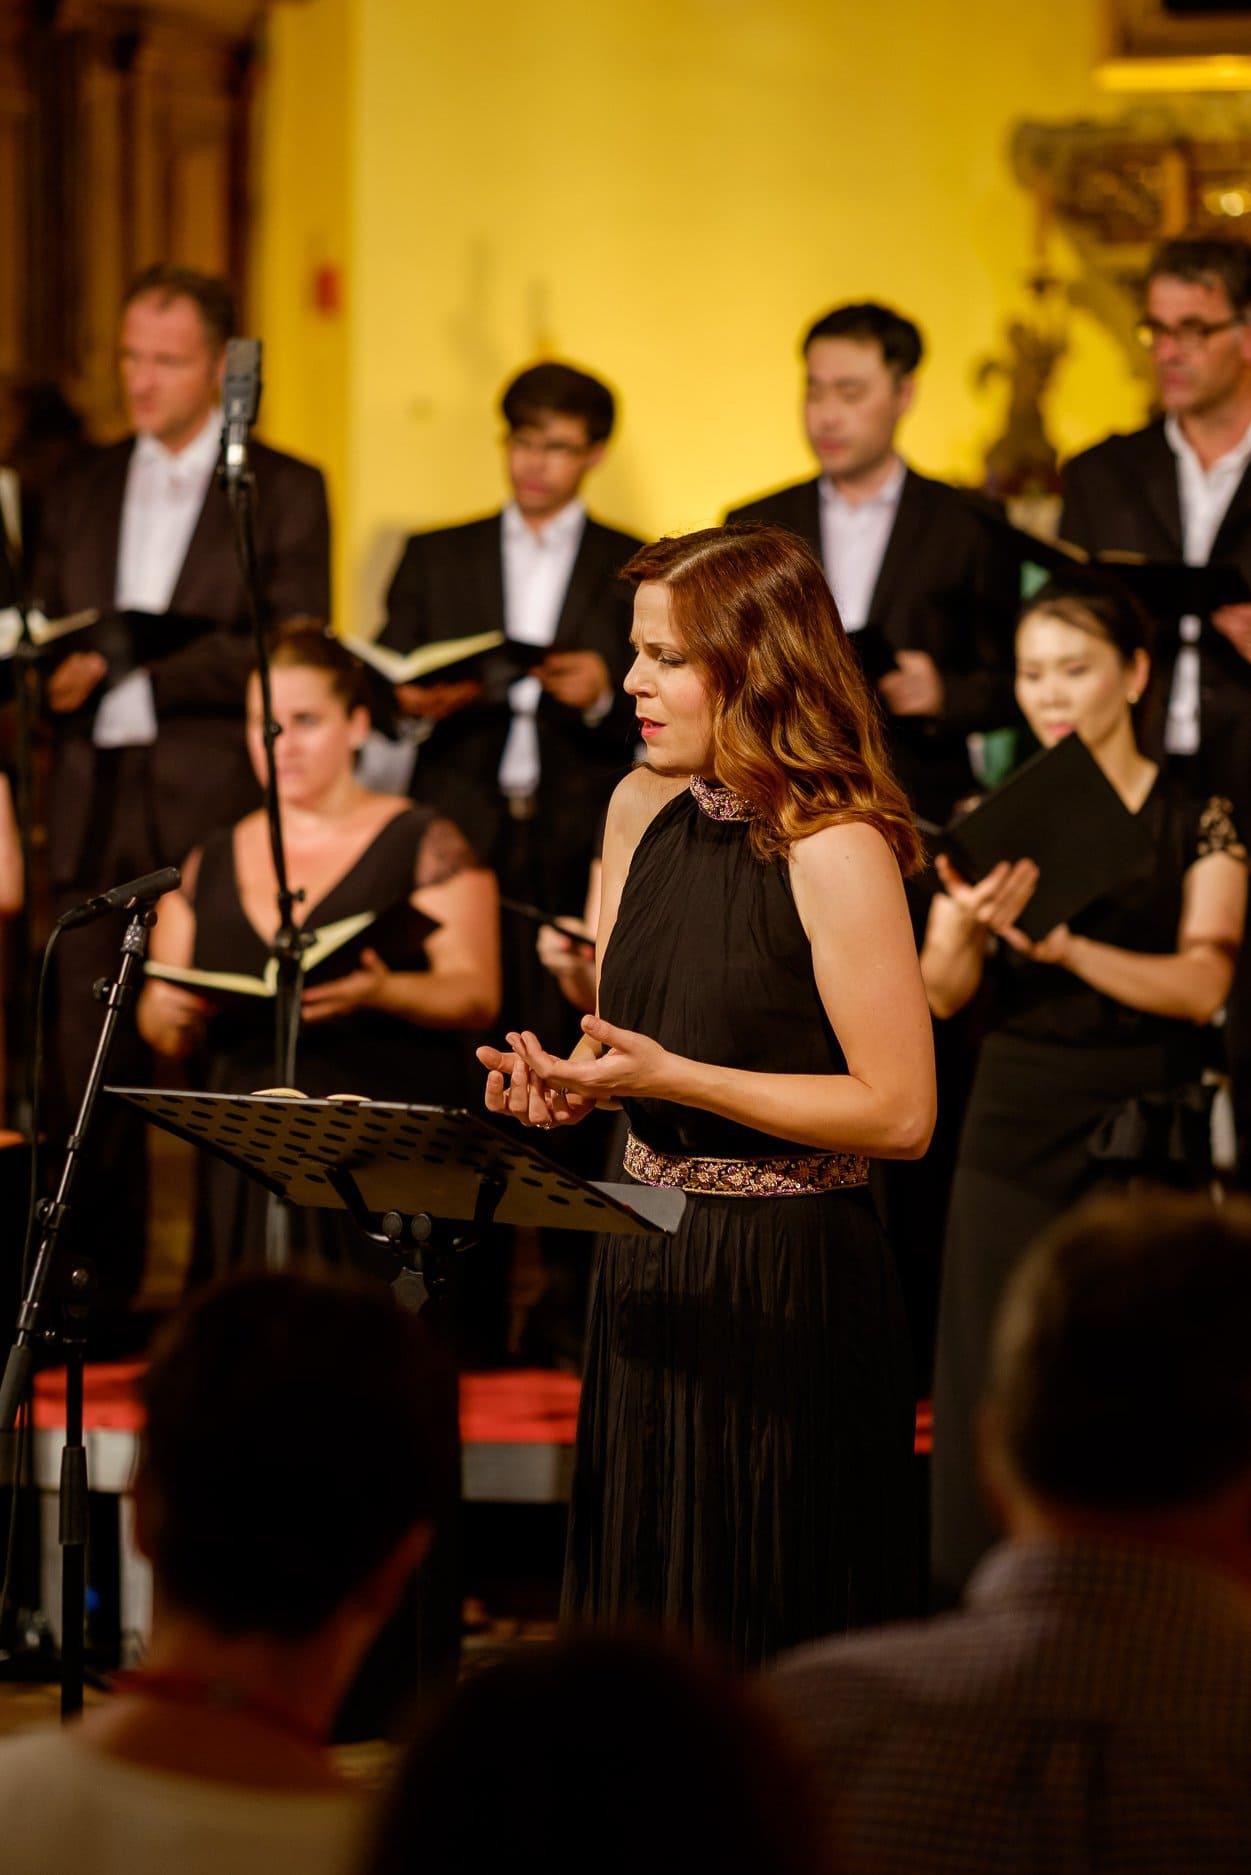 Marija Kuhar Šoša i Zbor Gustava Mahlera